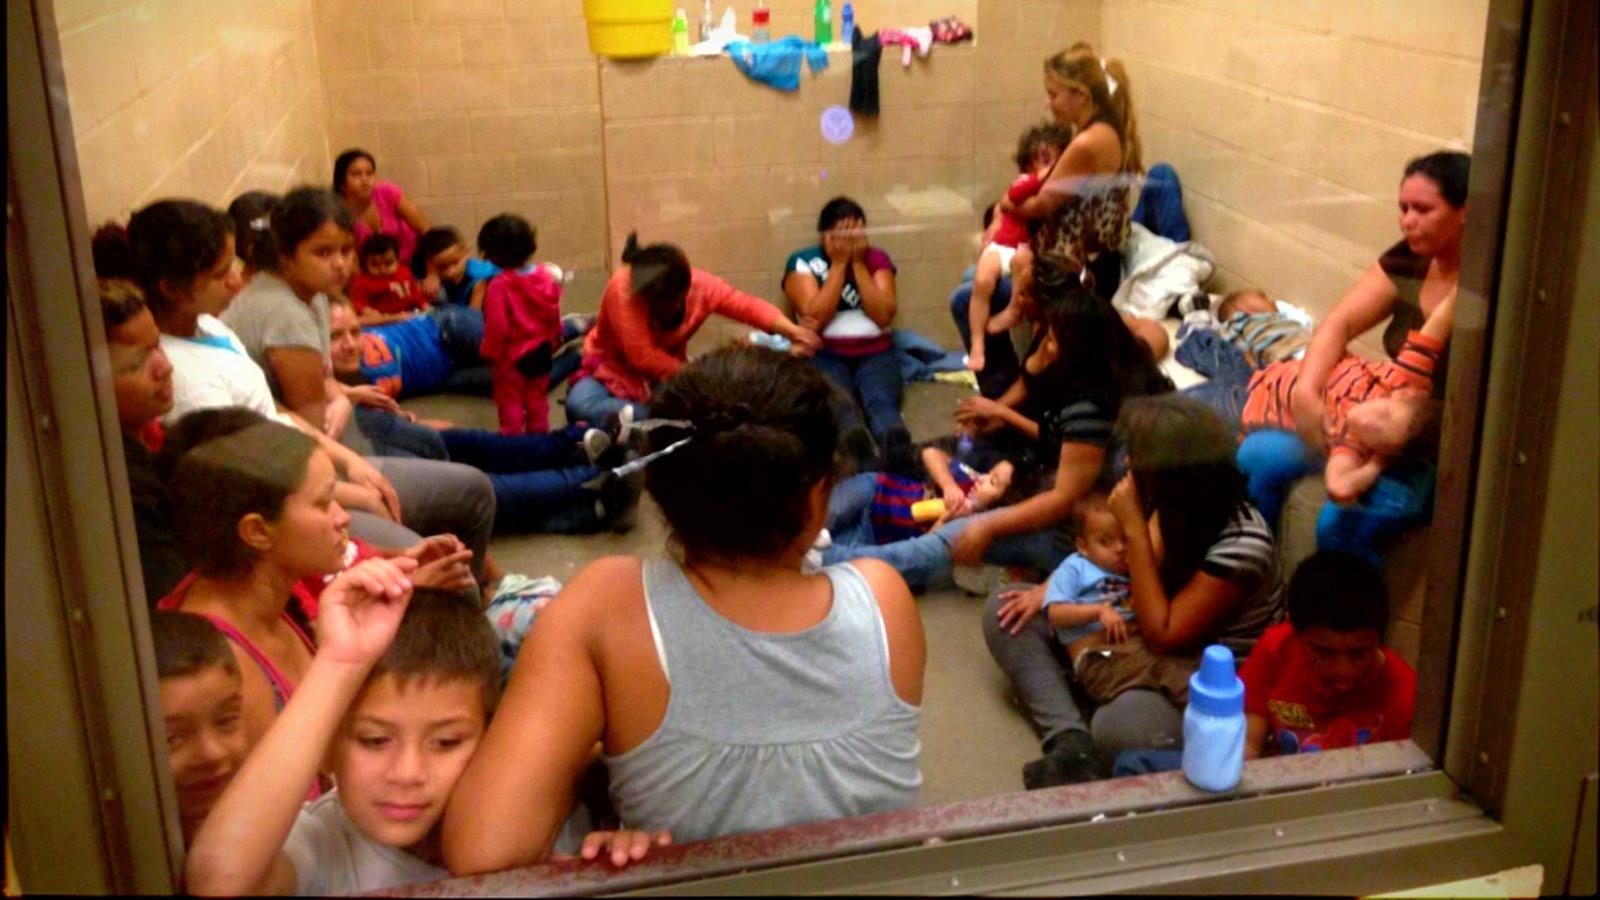 Brasile, custode asilo dà fuoco ai piccoli e si suicida